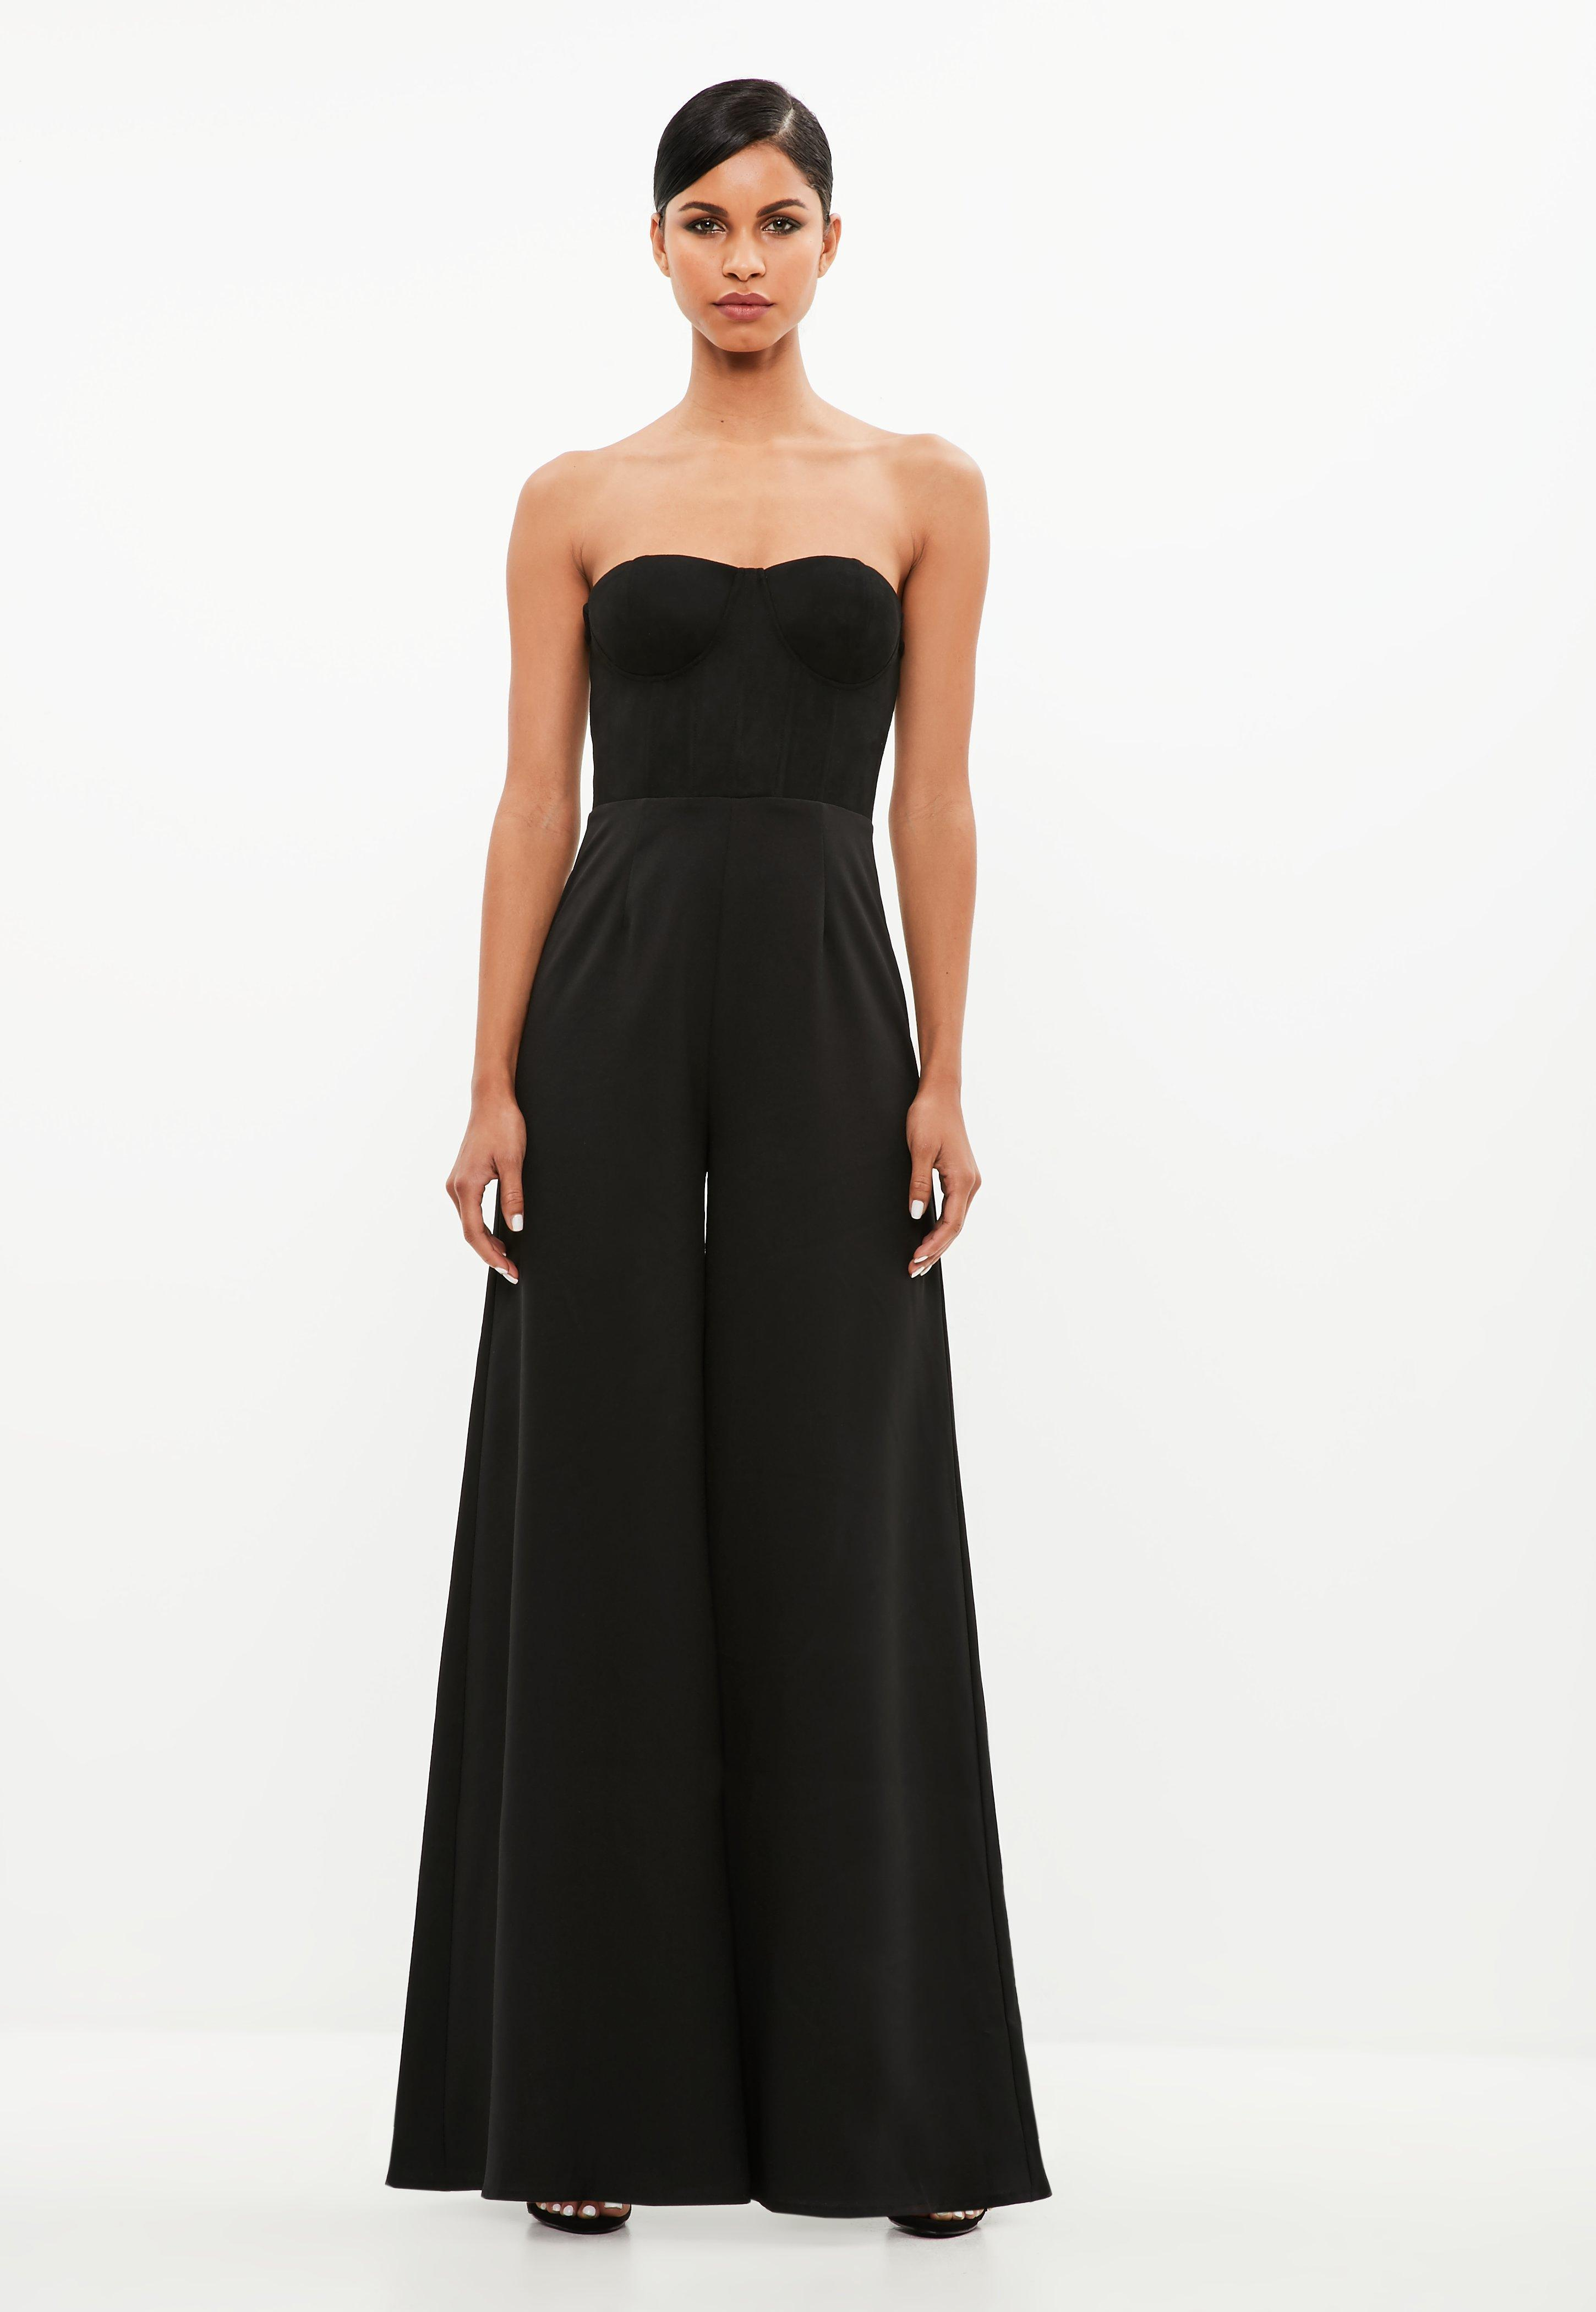 1d1176d24983 Missguided Peace + Love Black Faux Suede Cup Top Jumpsuit in Black ...